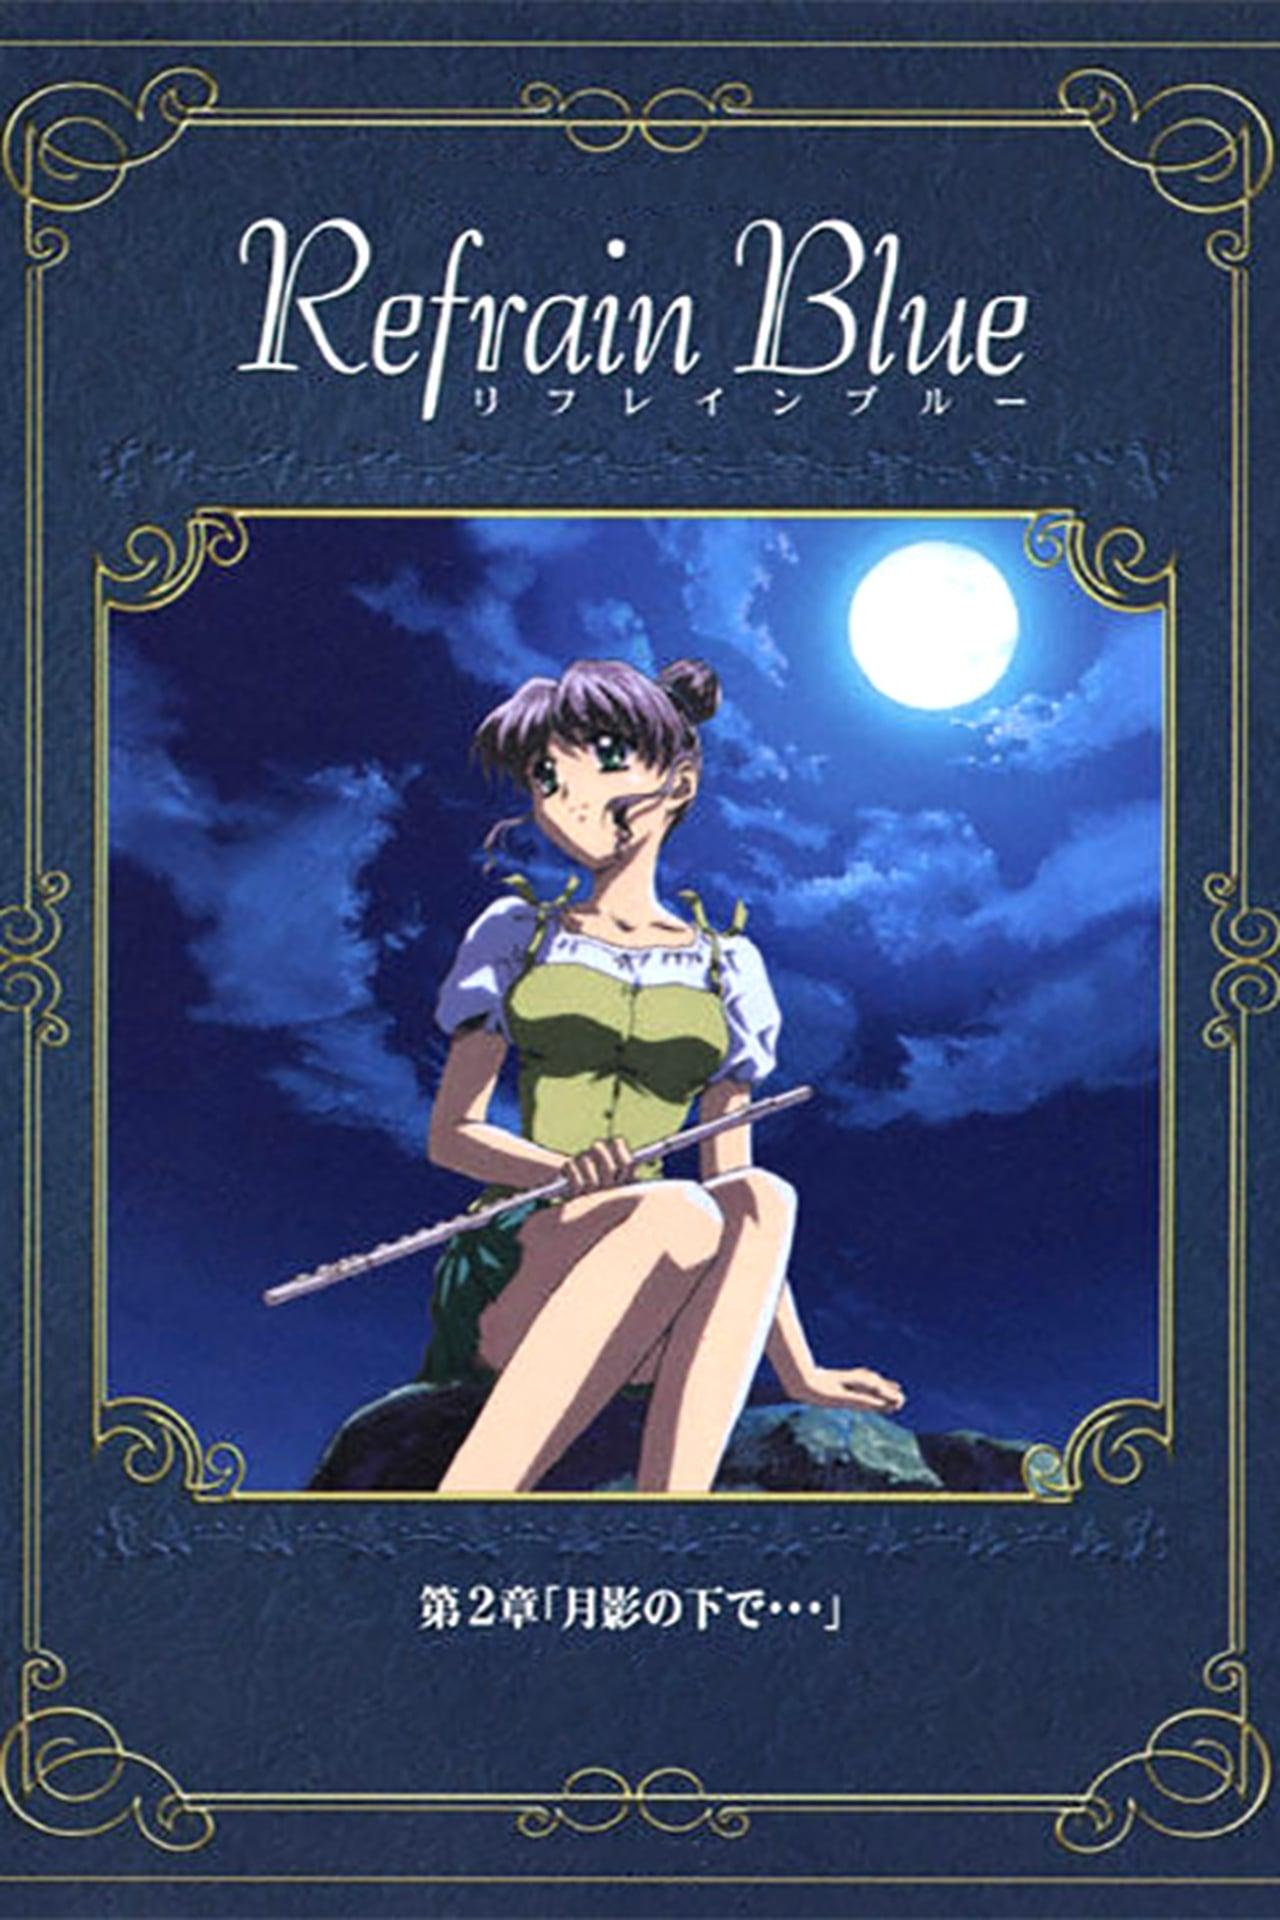 Refrain Blue: Chapter 2 - Beneath the Moon...